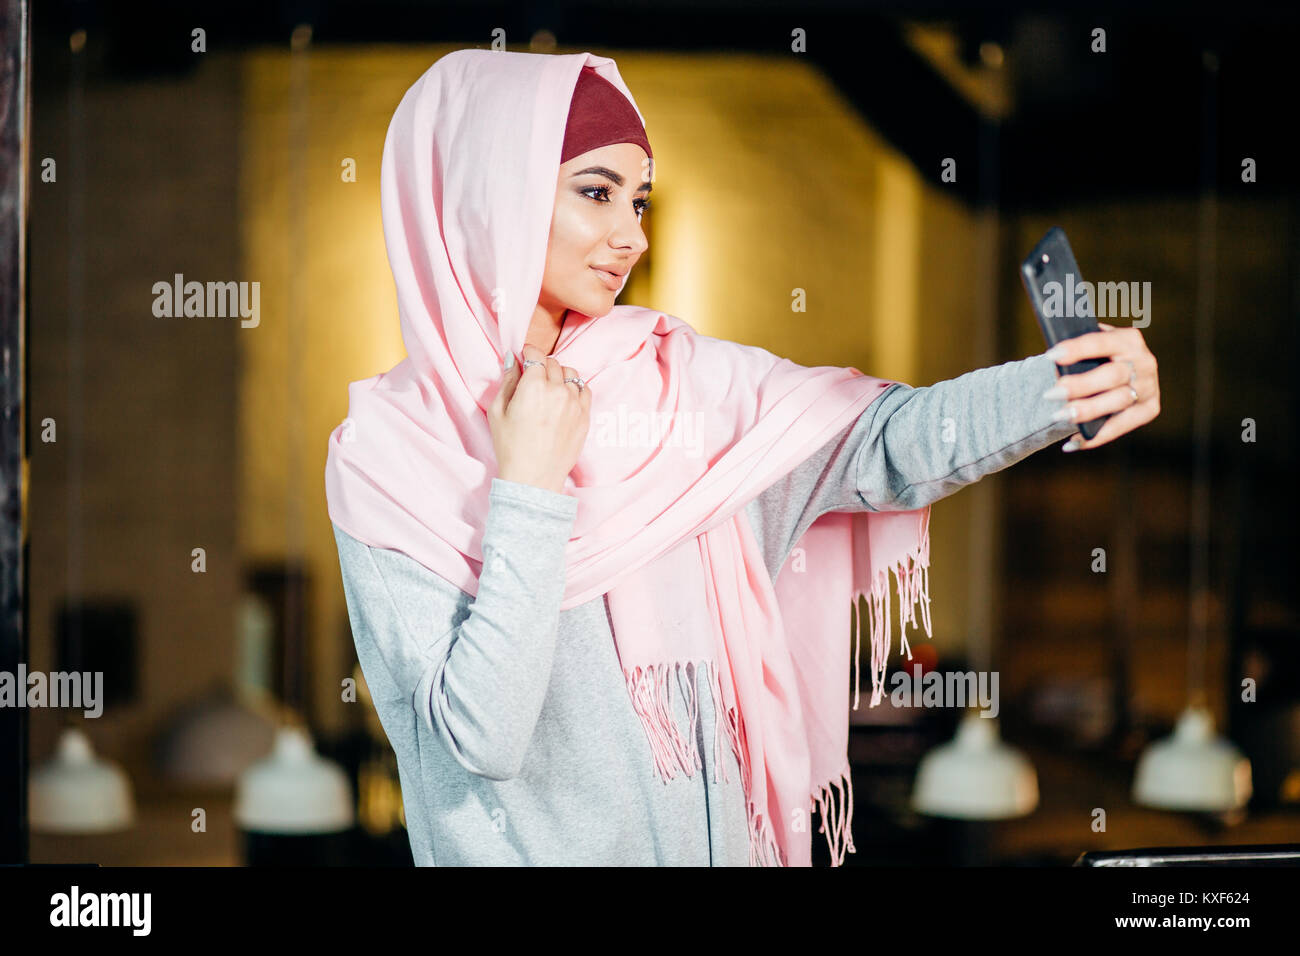 Arabian muslim woman taking selfie with phone in cafe - Stock Image